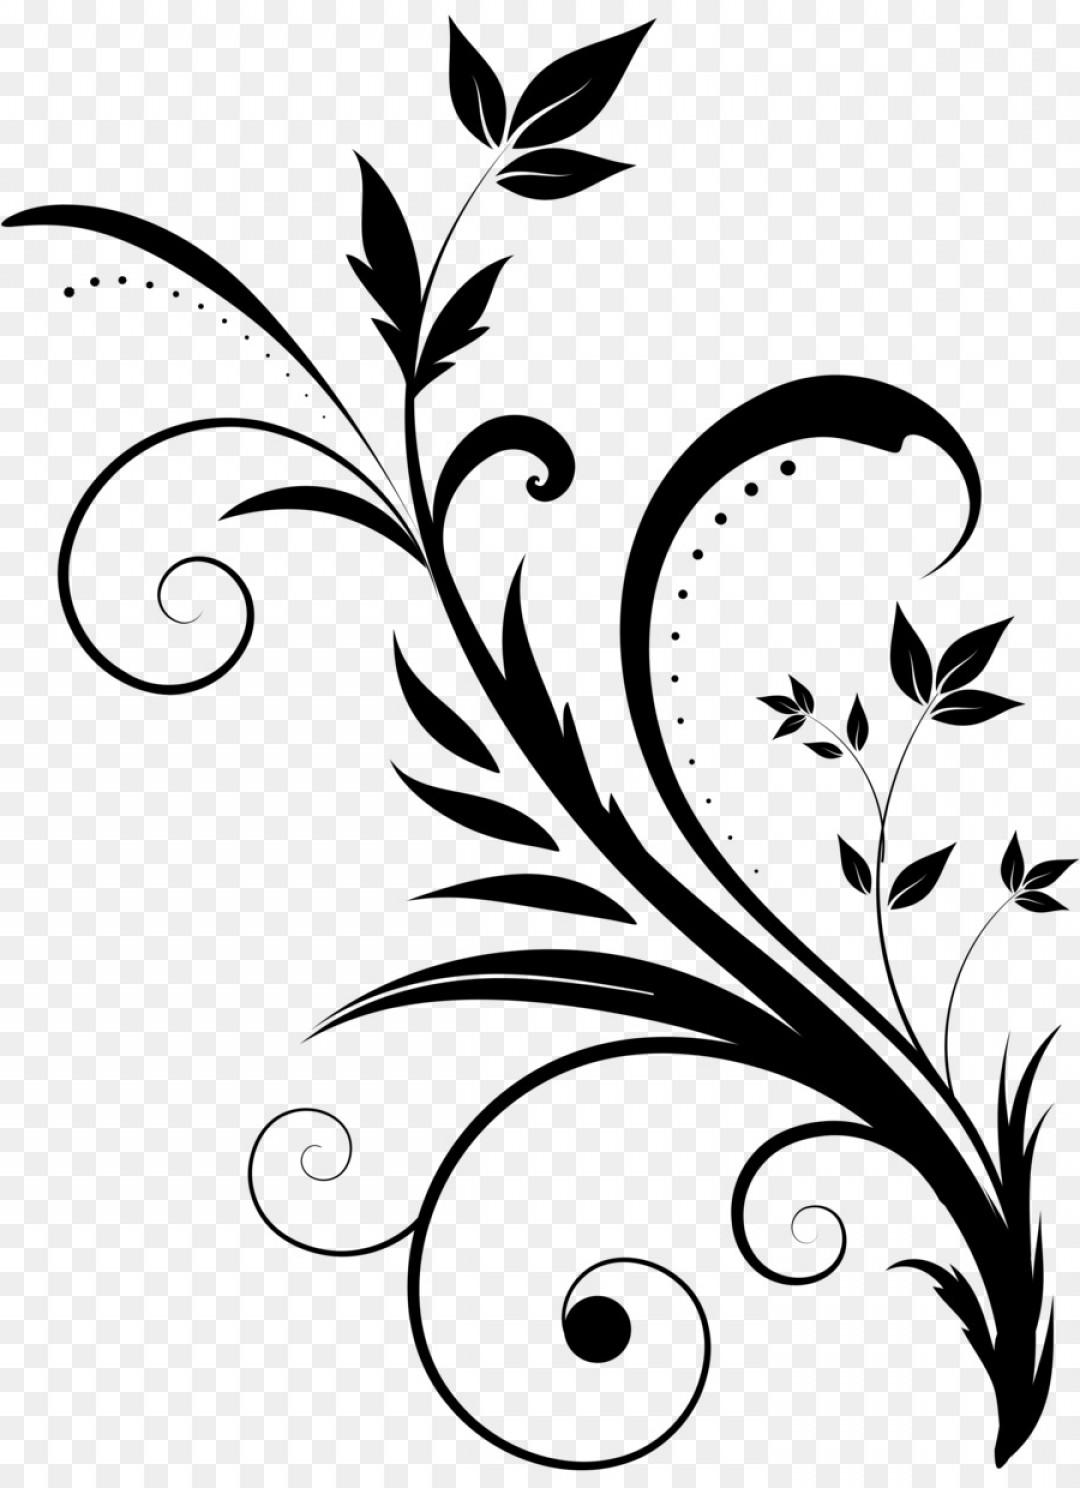 1080x1488 Png Drawing Clip Art Swirl Vector Shopatcloth